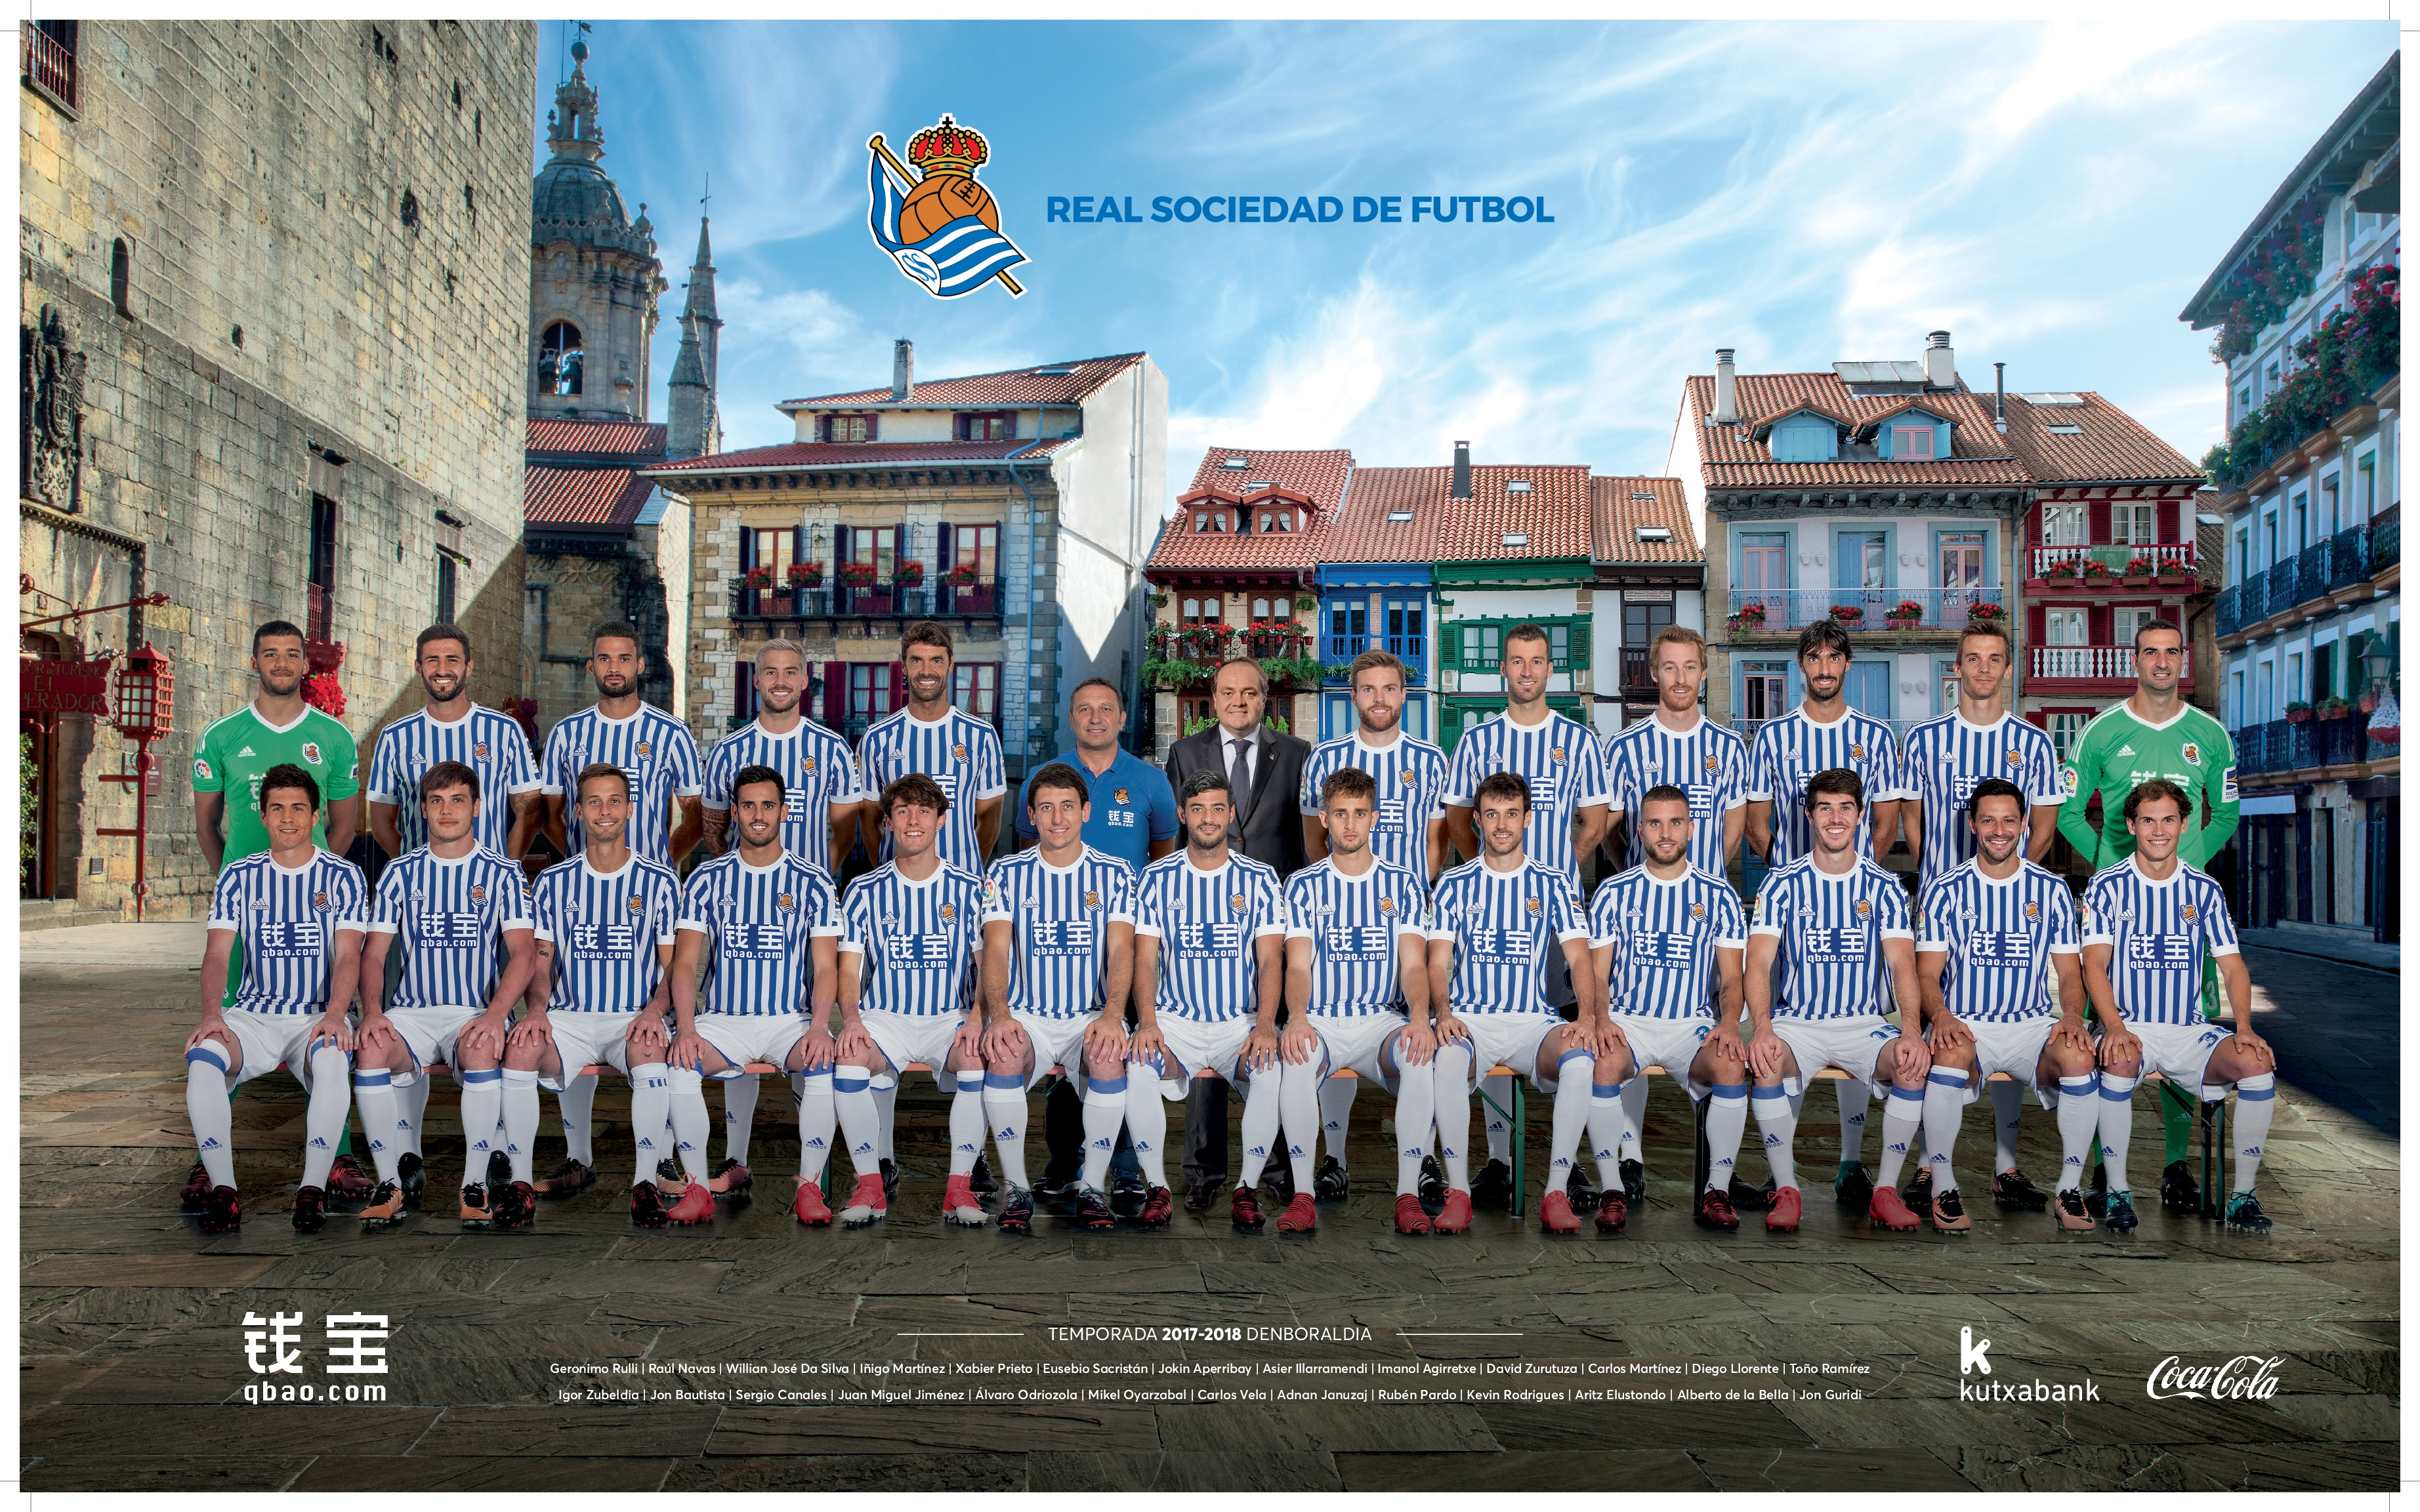 Hilo de la Real Sociedad Cbf297d3-56ed-4915-ac47-11cd08352bd9